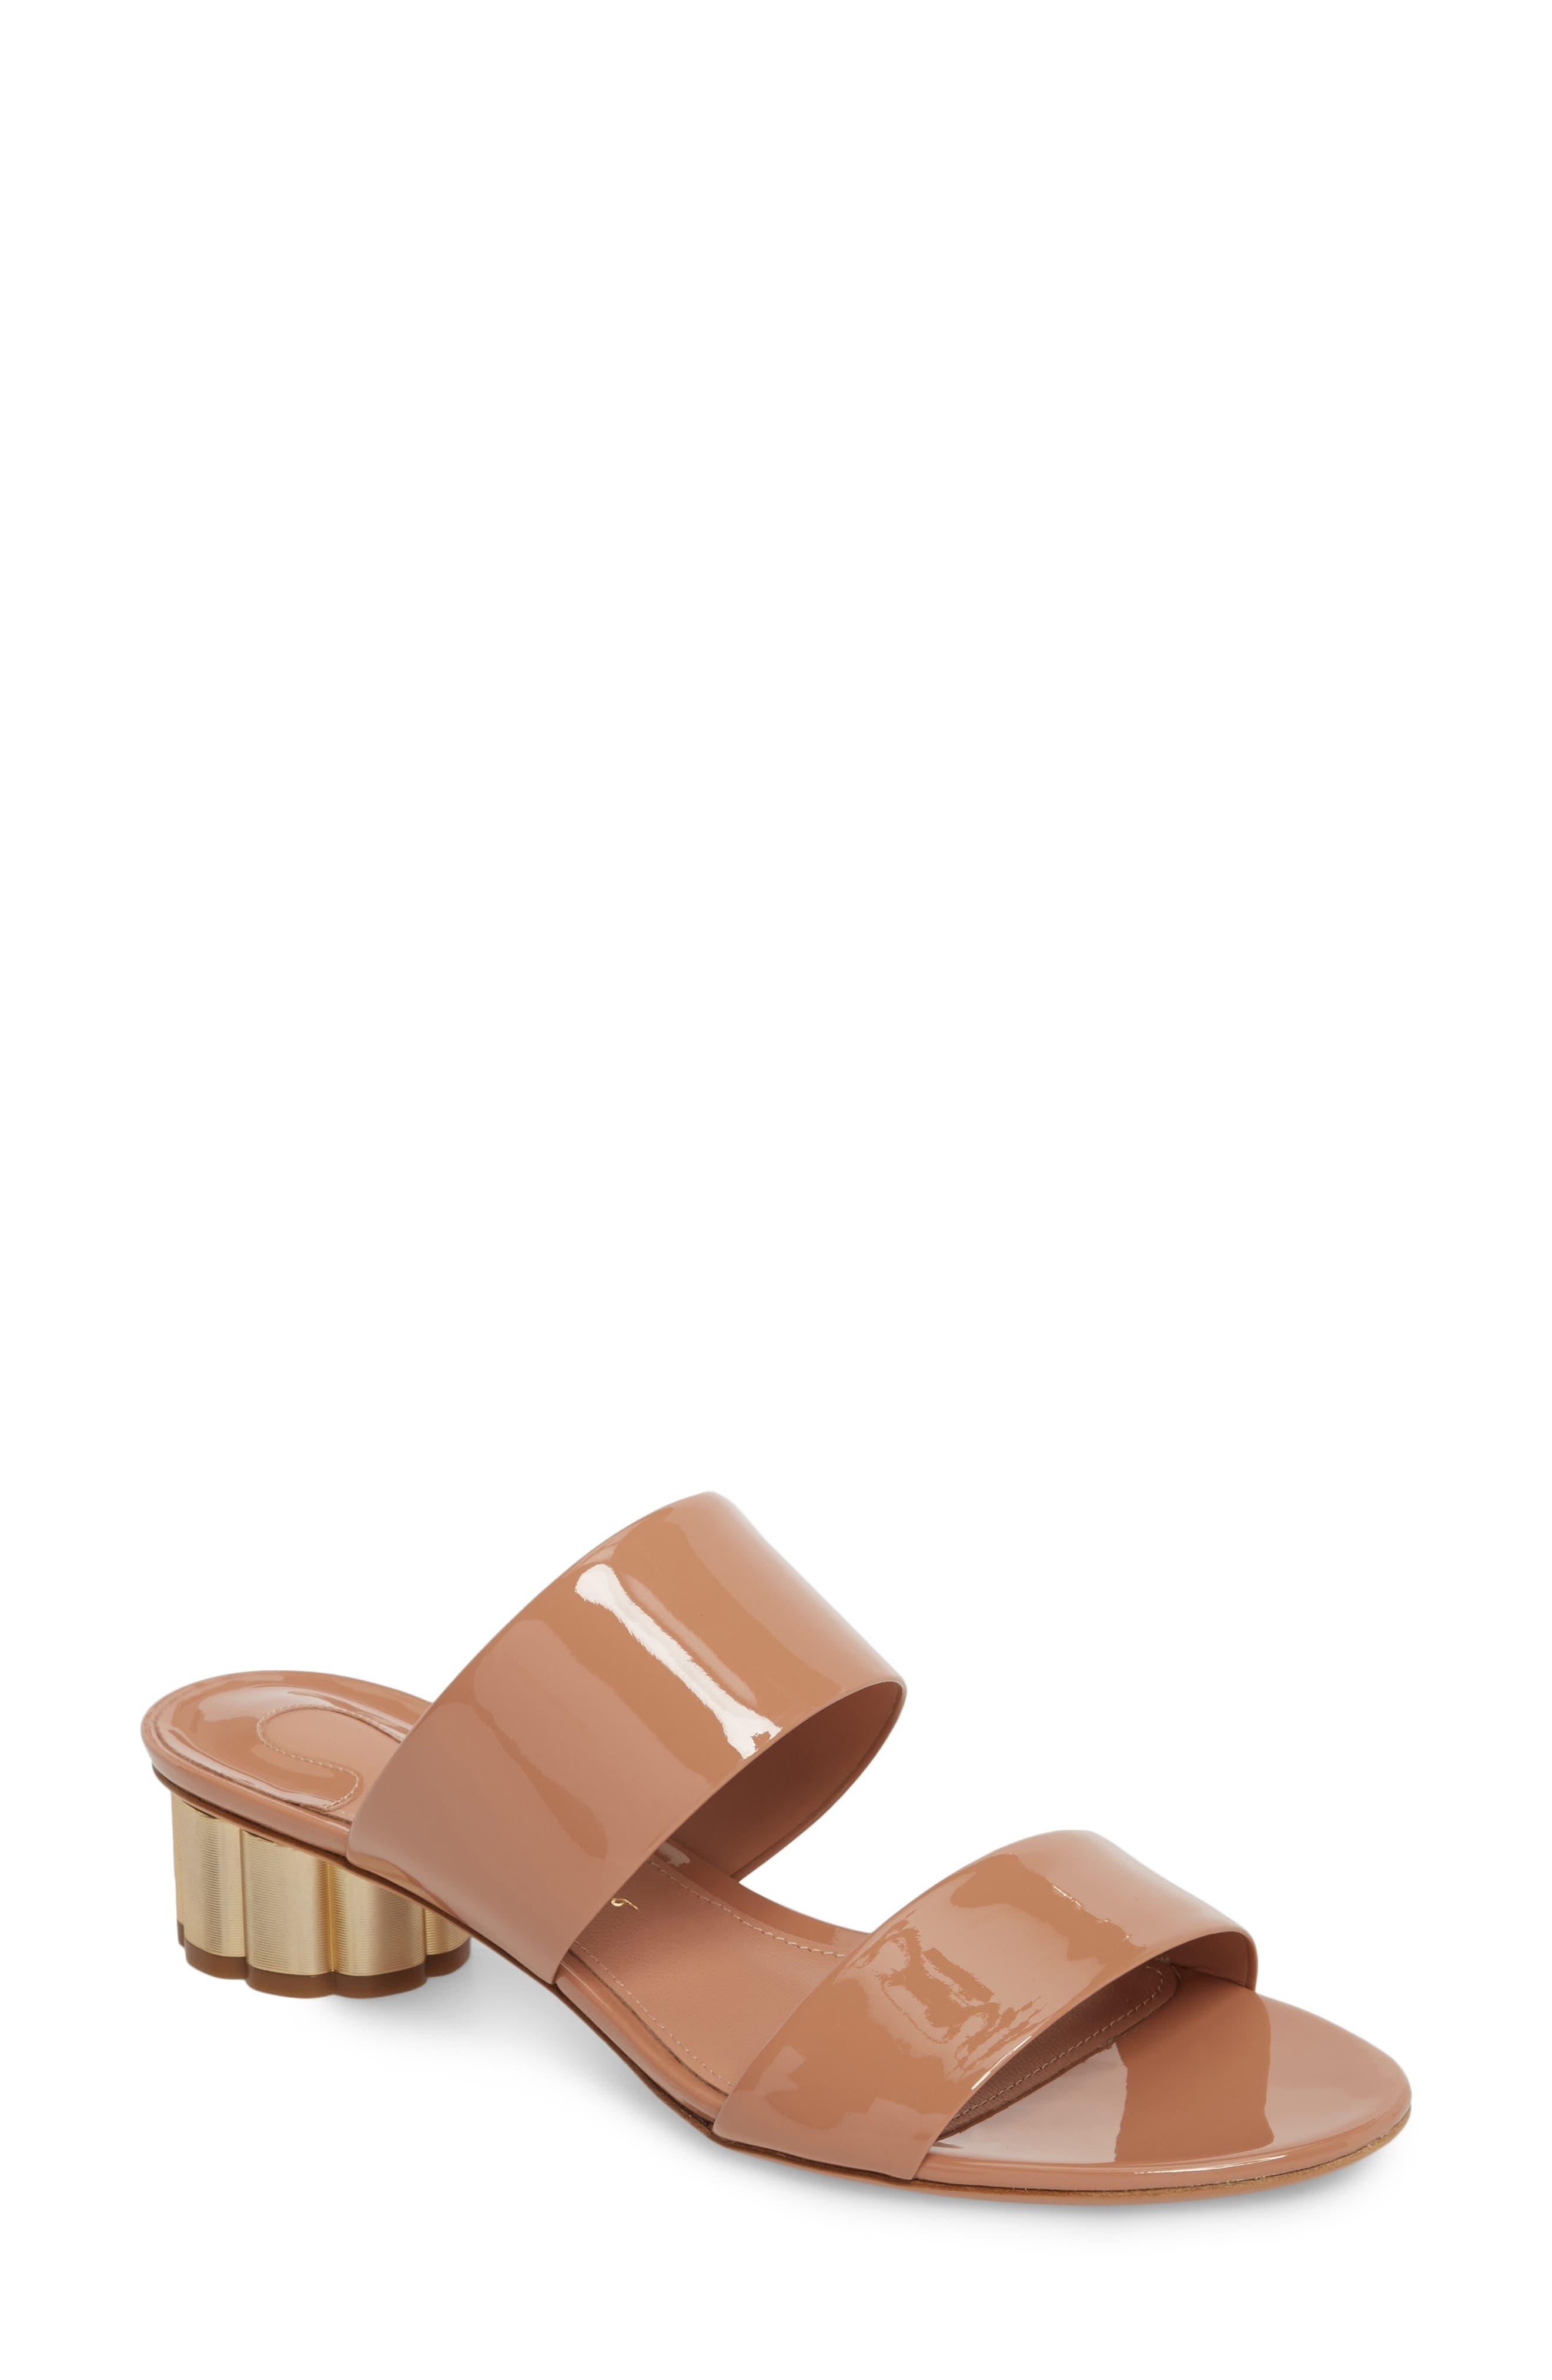 Salvatore Ferragamo Belluno Double Band Slide Sandal (Women)